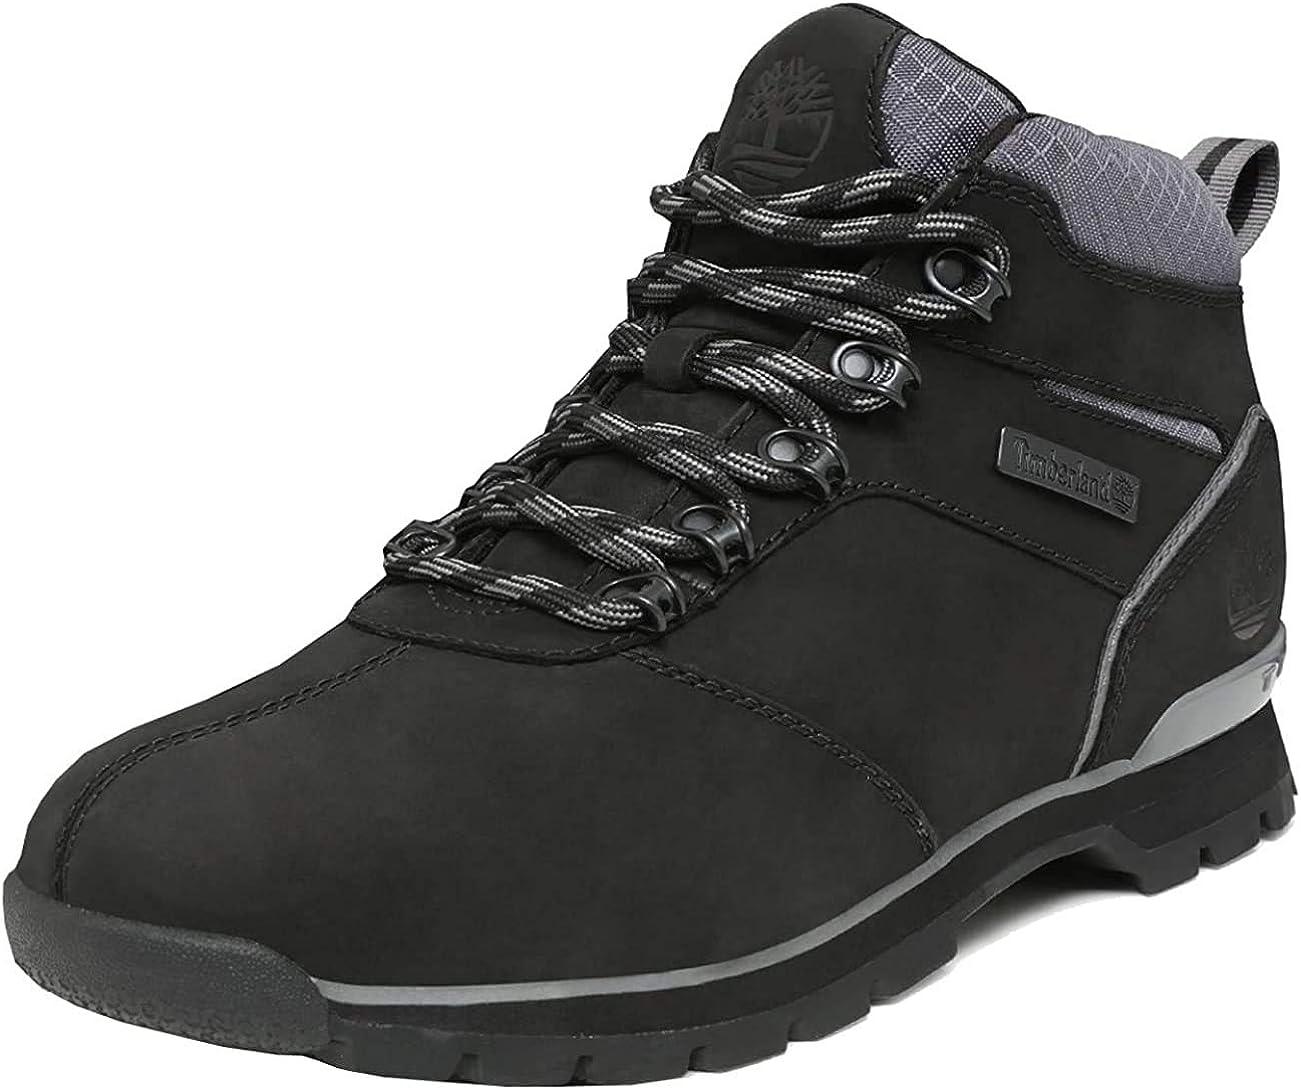 Mens Timberland Splitrock 2 Winter Walking Hiking Outdoor Ankle Boot